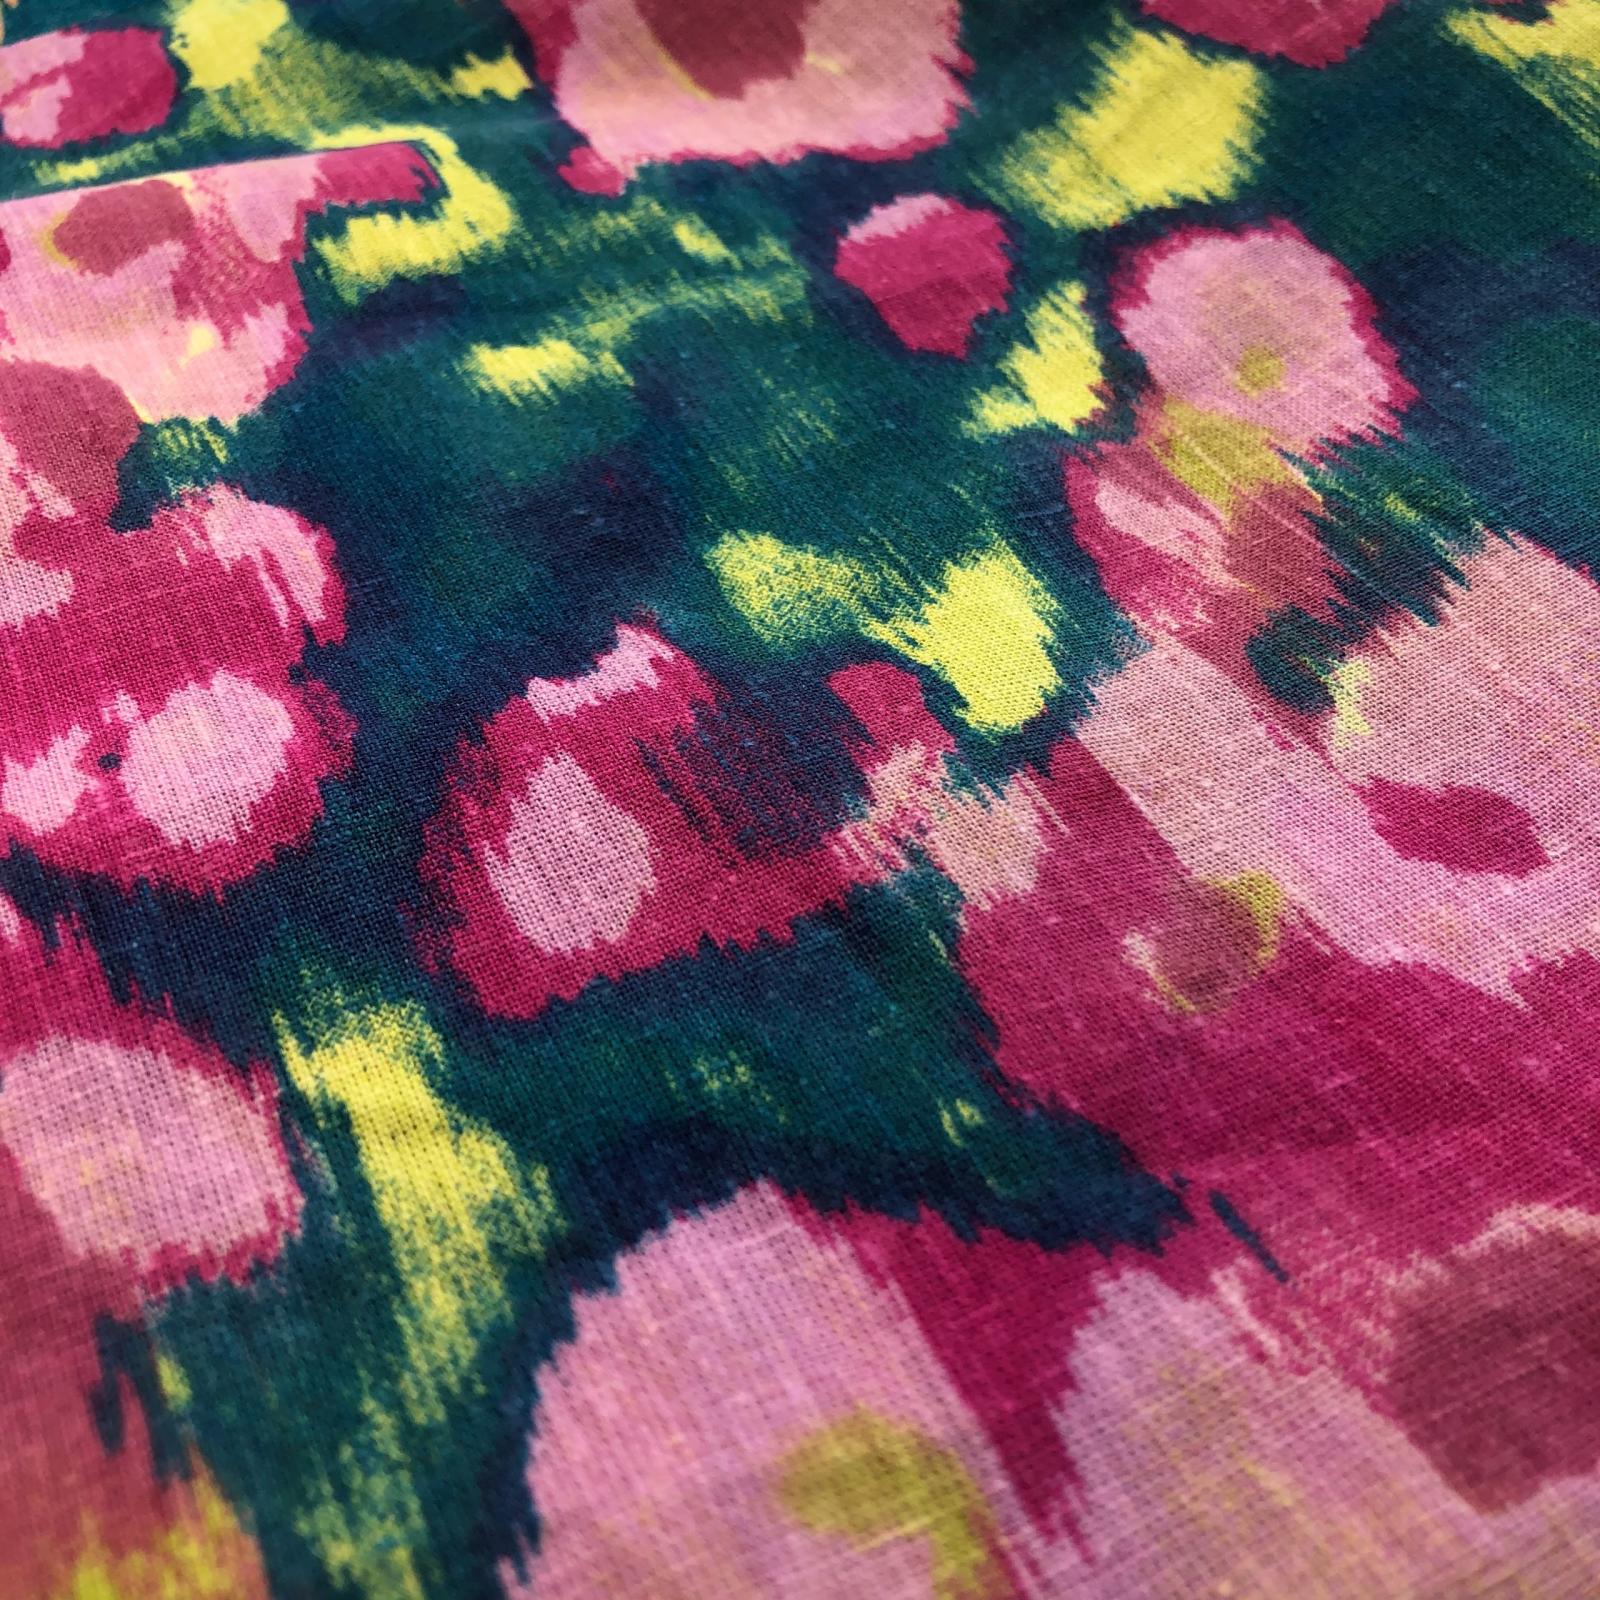 Designer Deadstock Plain Weave Hemp / Organic Cotton - Pink/Blue 58